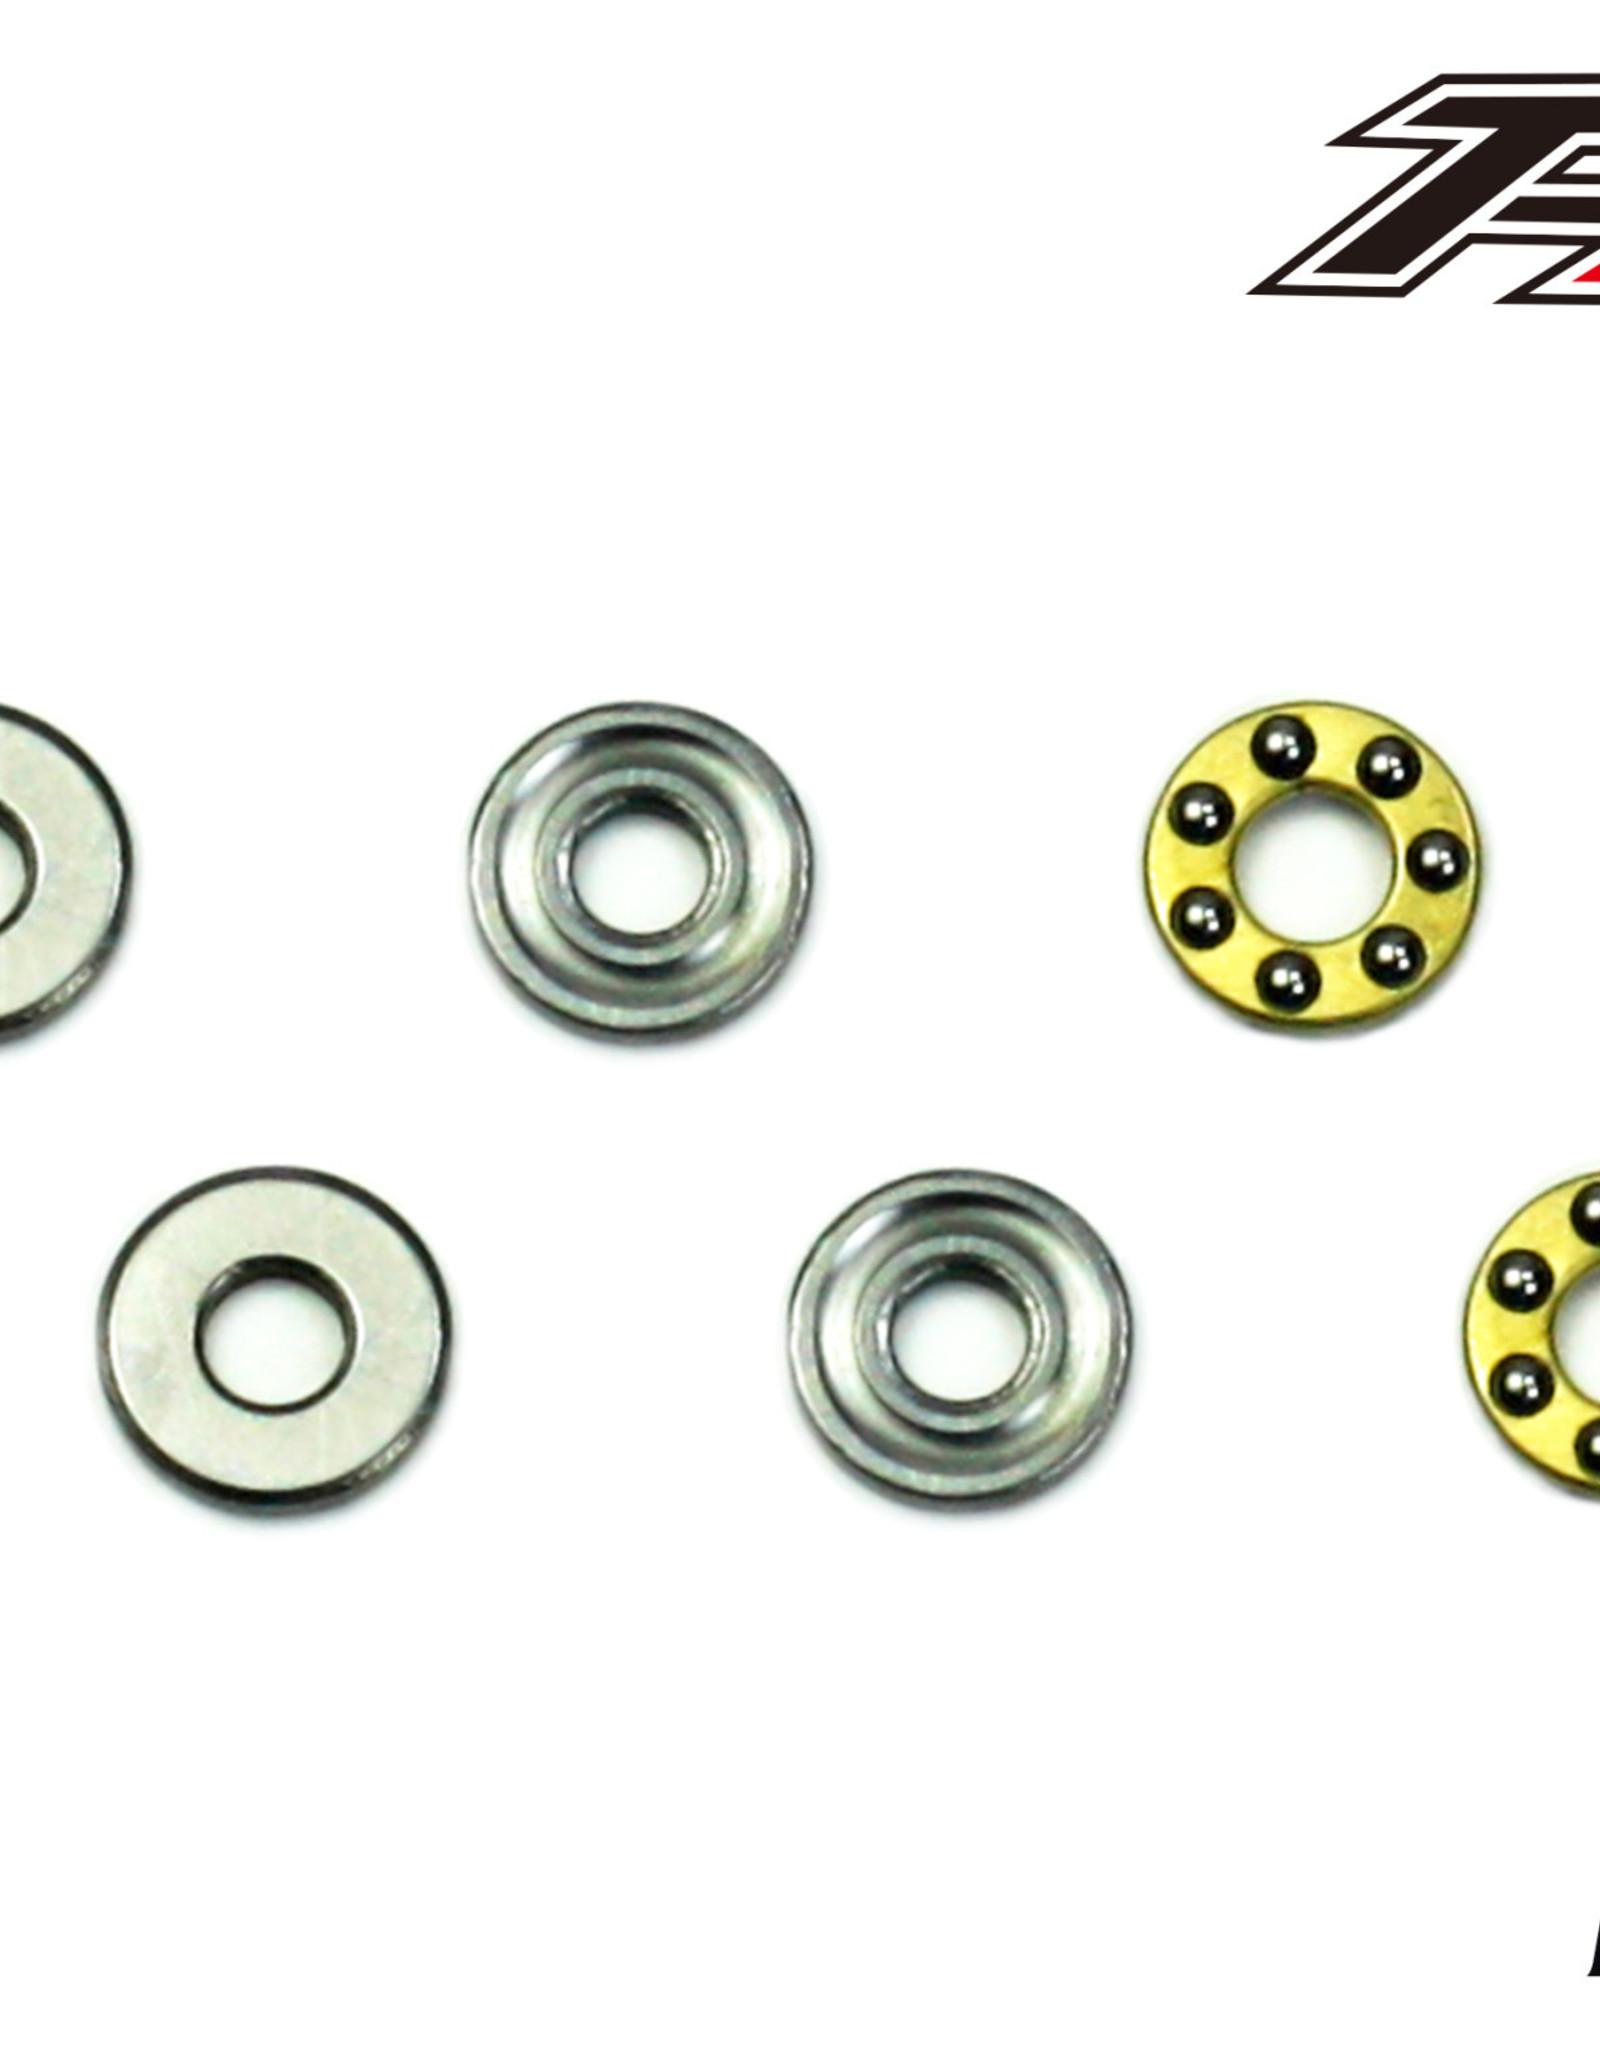 SAXO Carbide 3x8x3.5mm Ball Bearing Axial F3-8(F3-8M)